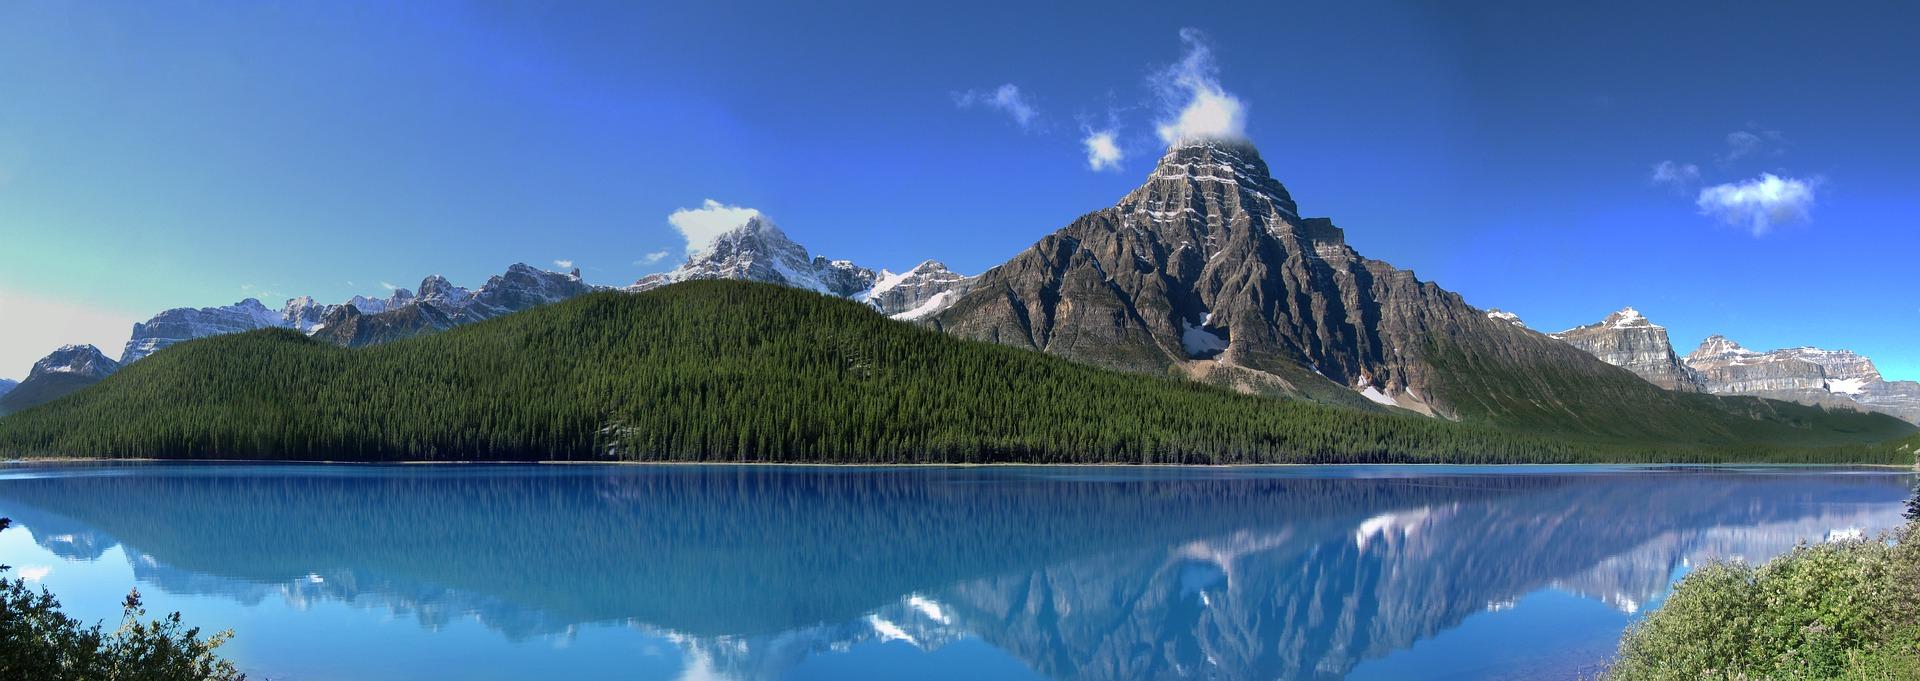 Canada Rockies tour escorted